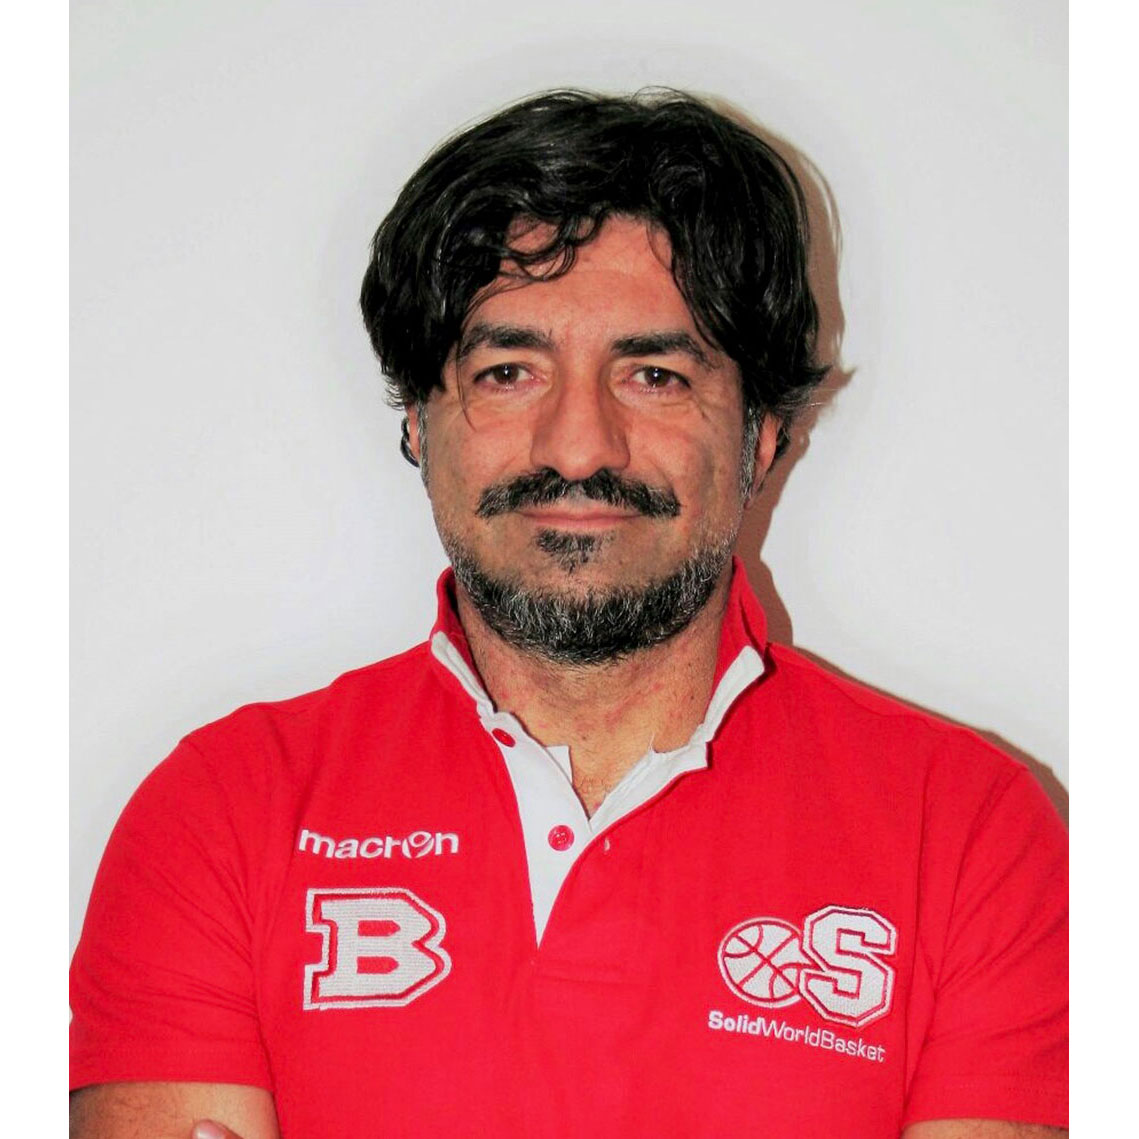 Sergio Giarrizzo